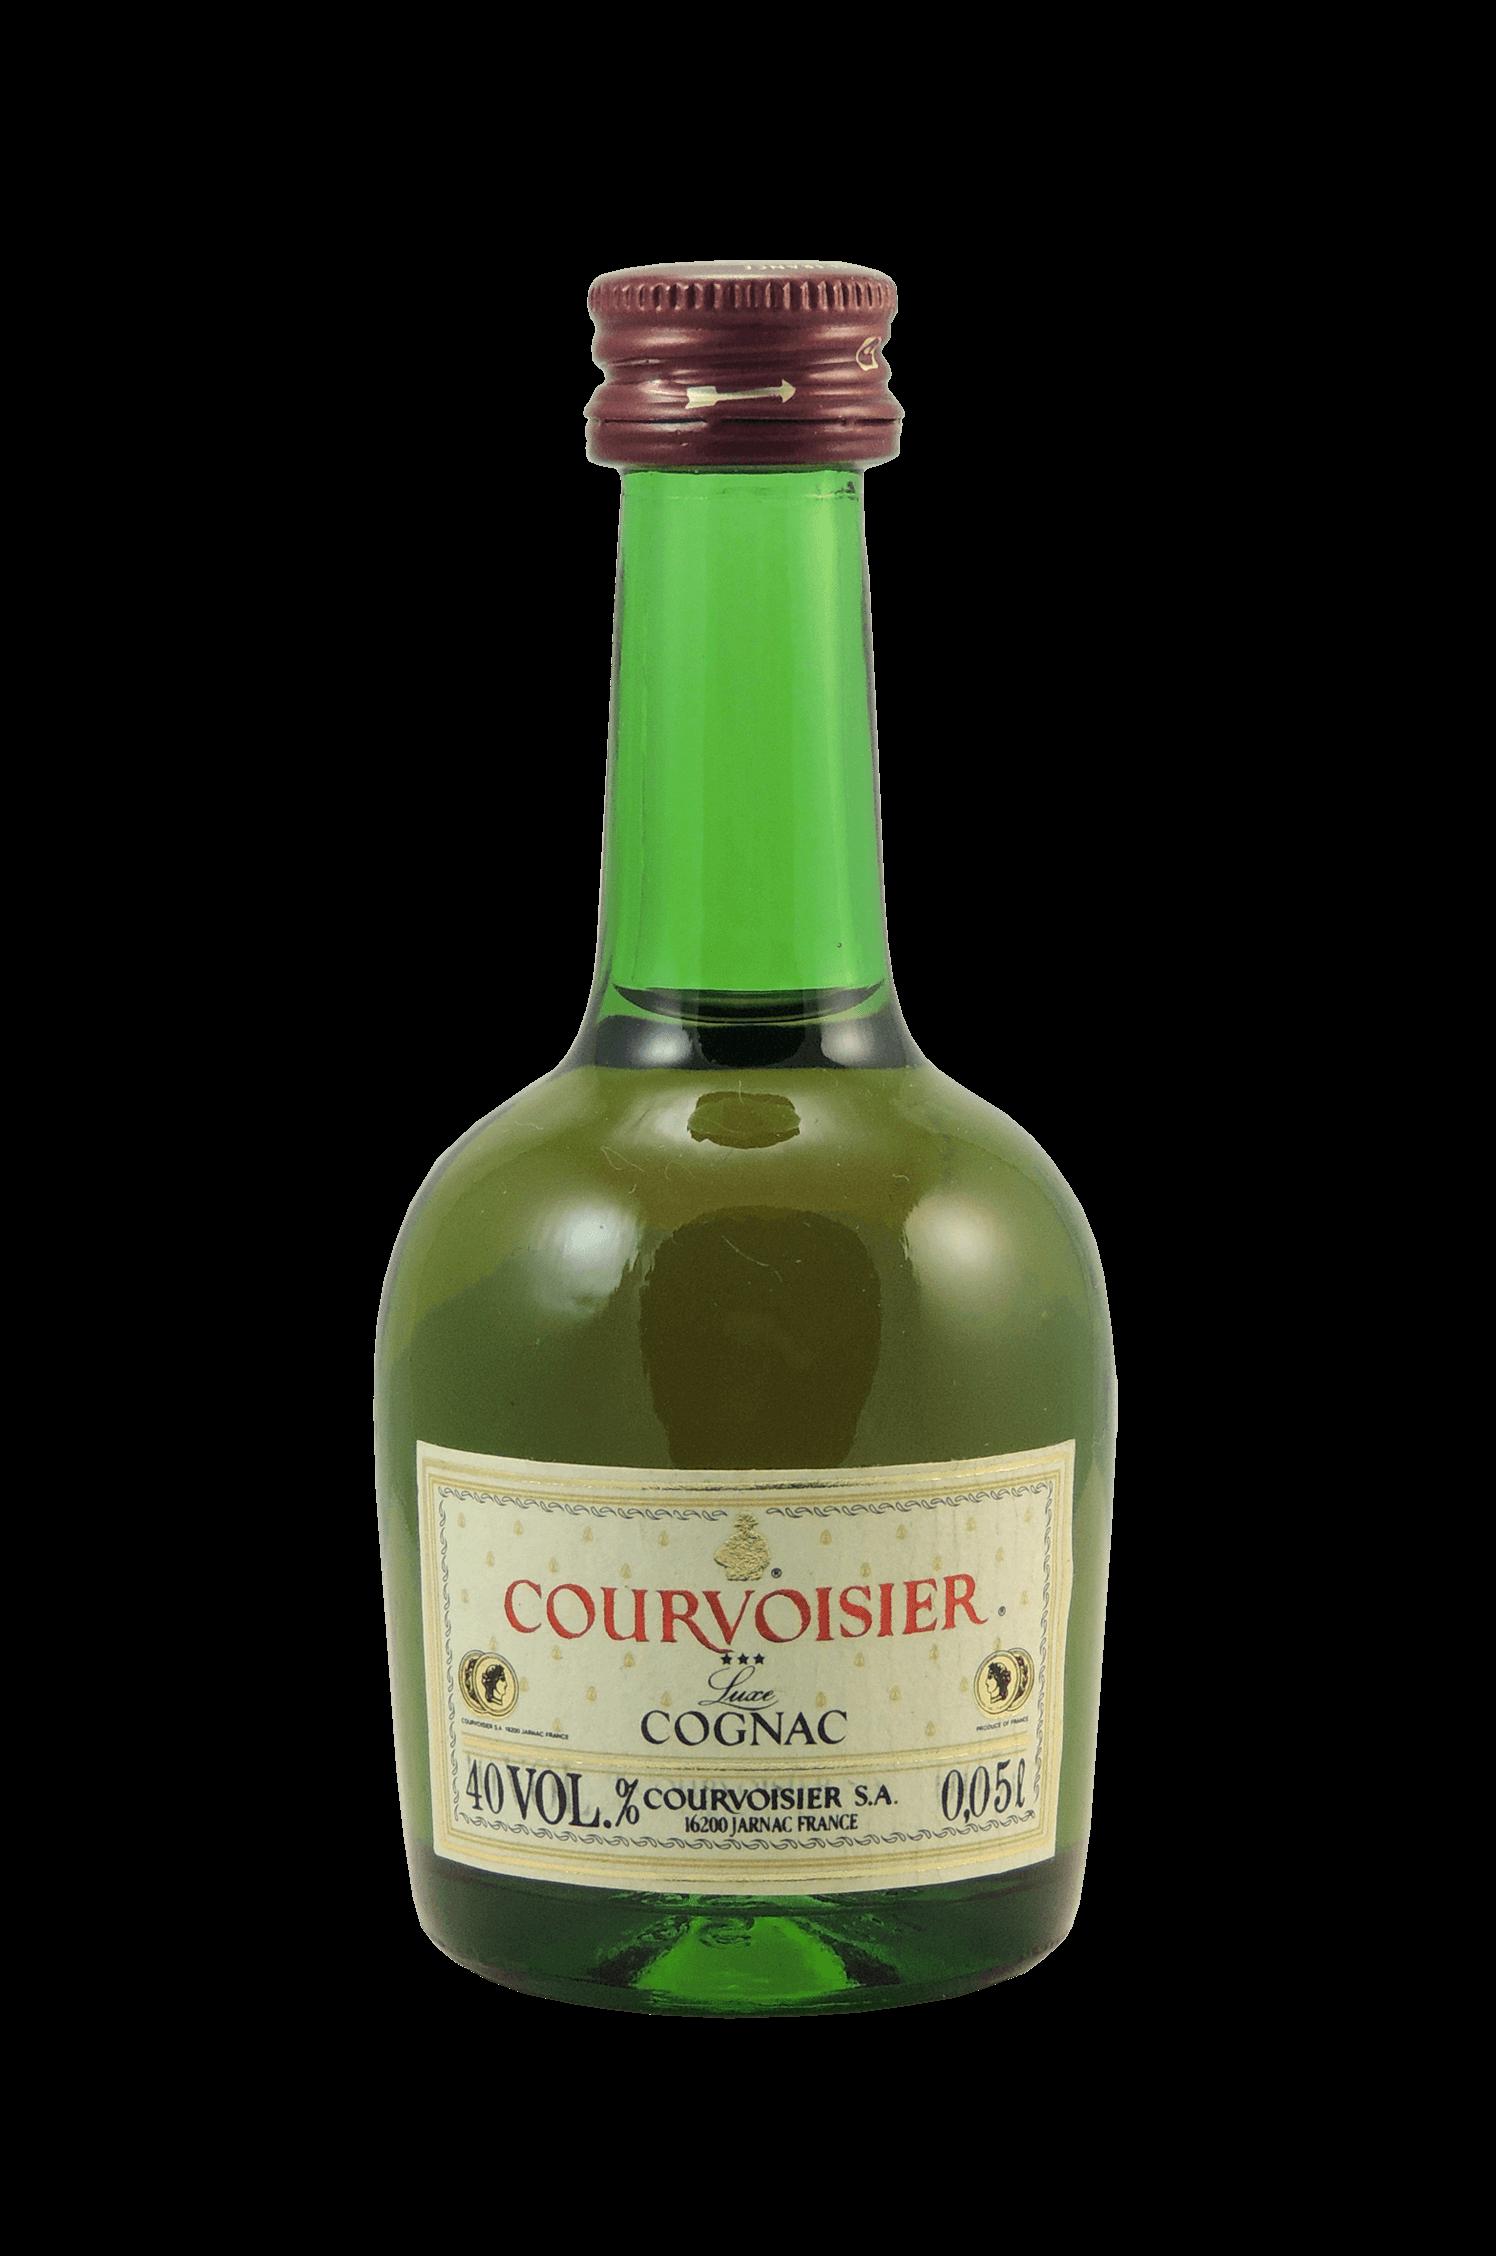 Courvoisier S.A. Luxe Cognac